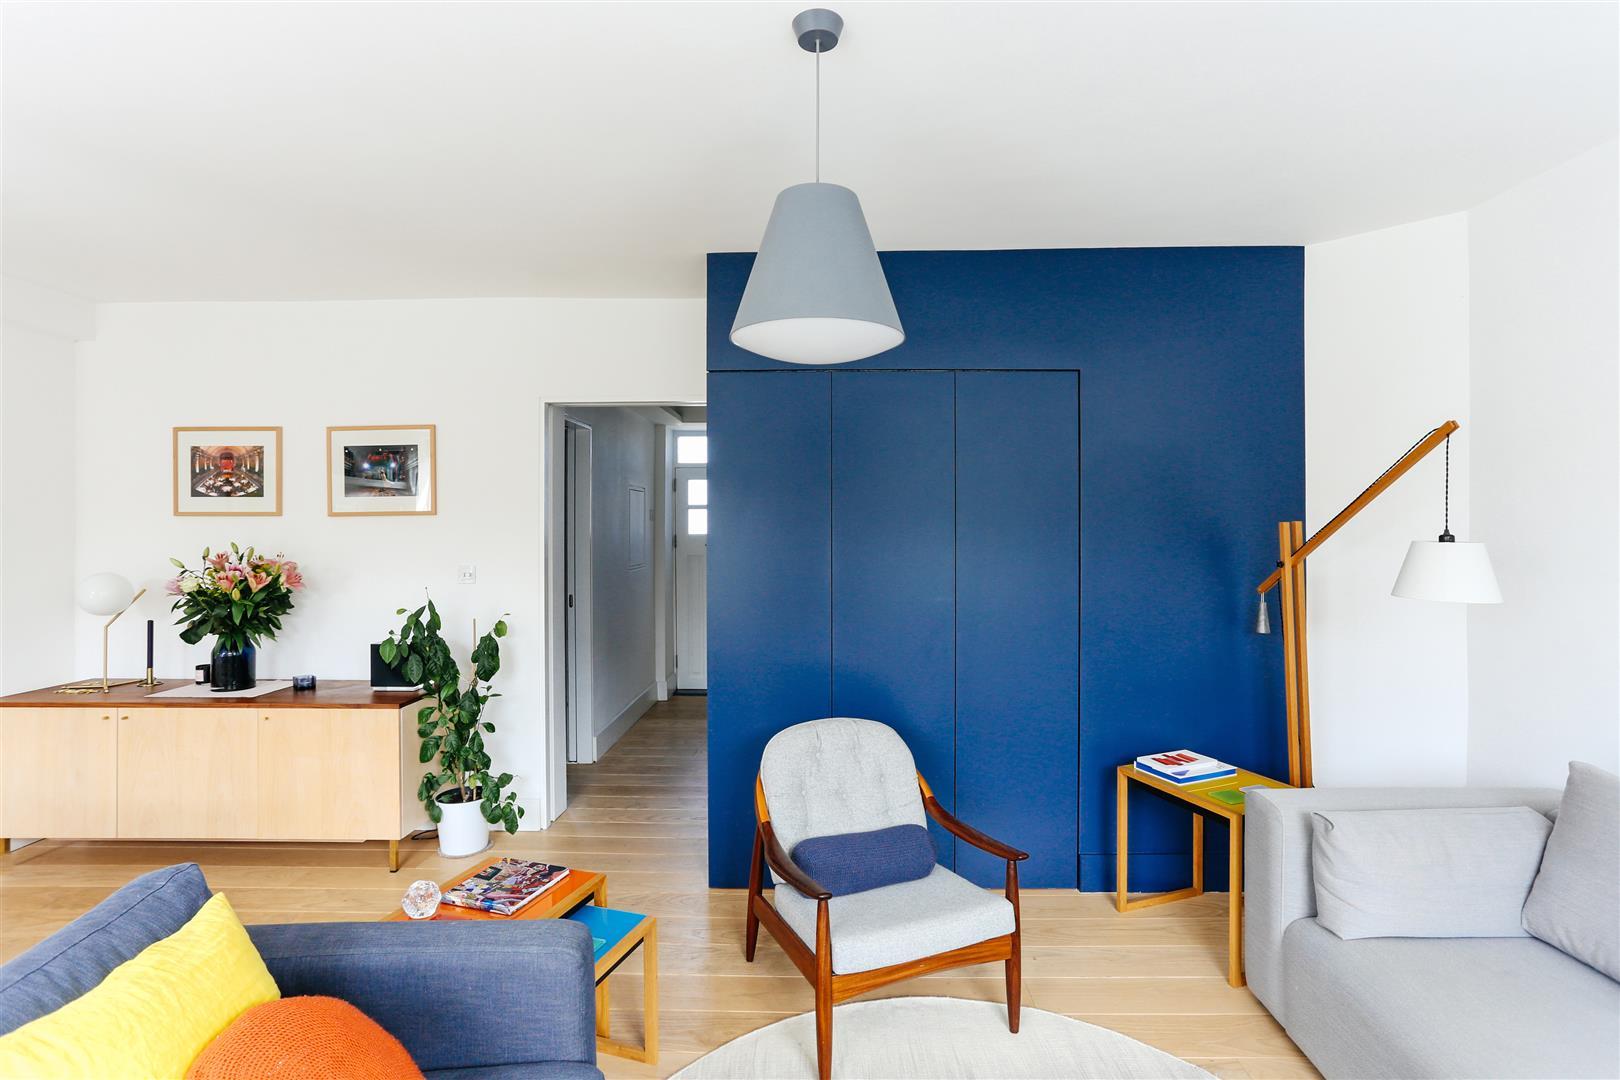 Mill Row, Haggerston, London N1, 3 bedroom flat for sale - 48039560 ...